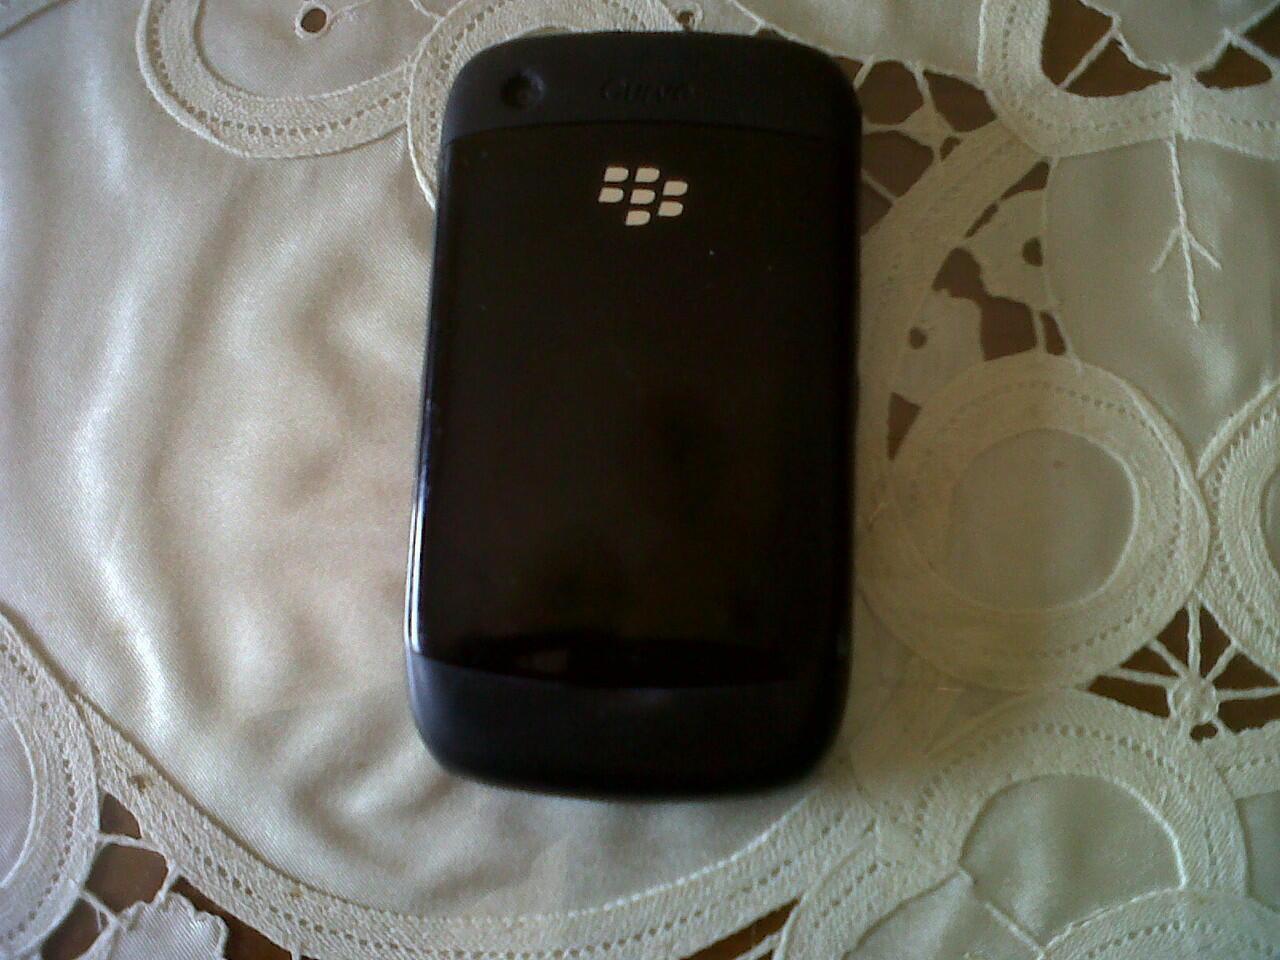 Jual blackberry gemini 8520 ex-tam Murah bandung